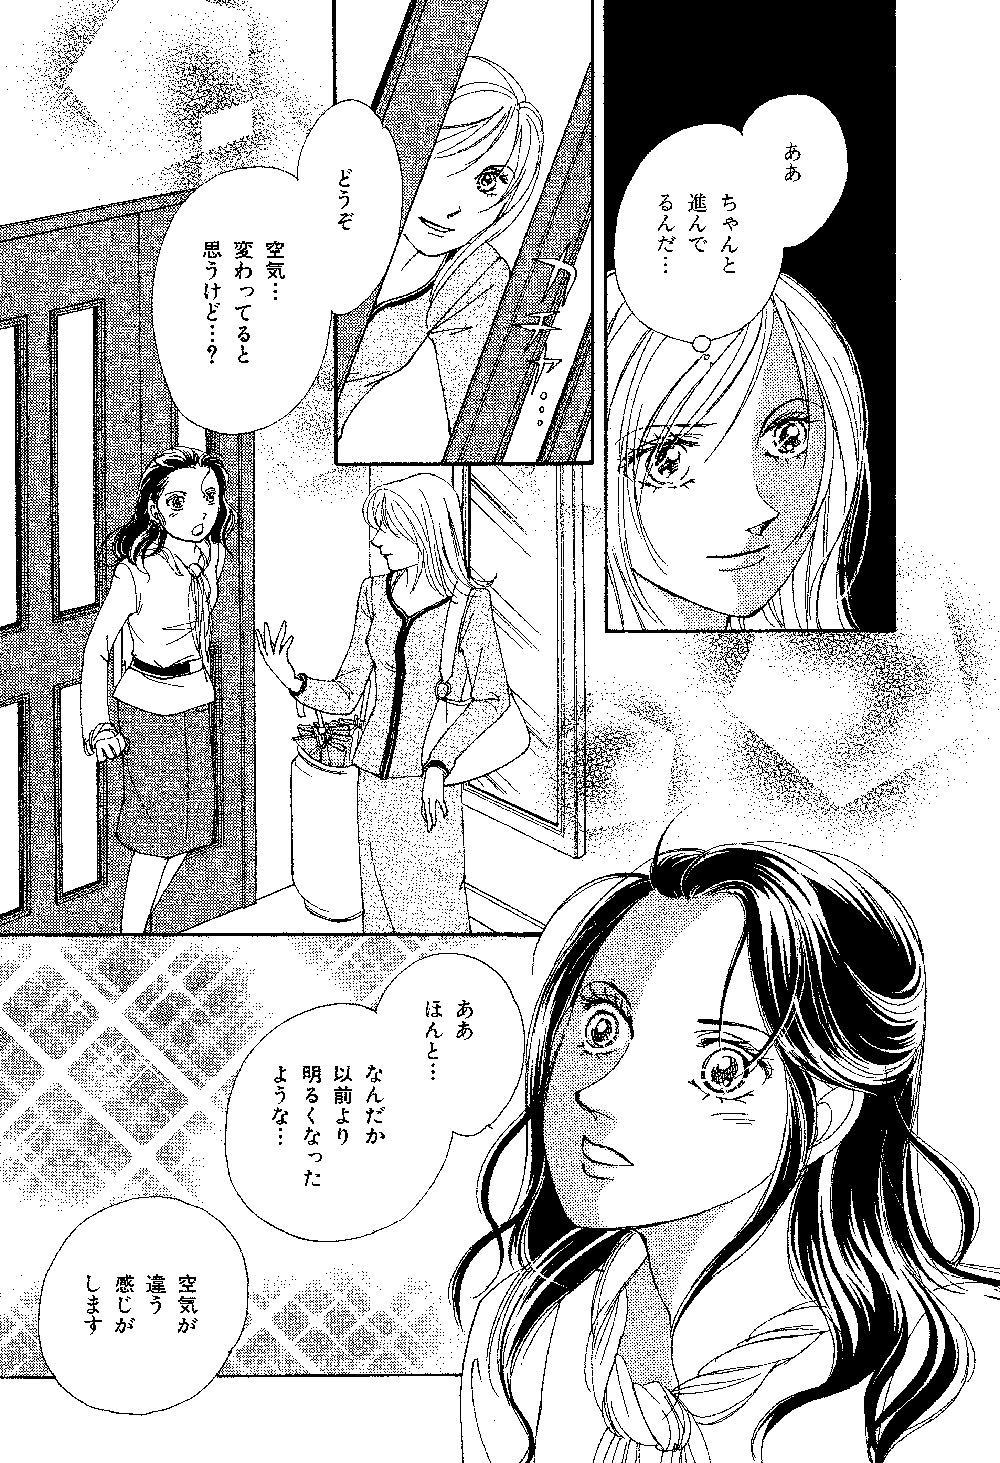 mayuri_0001_0051.jpg